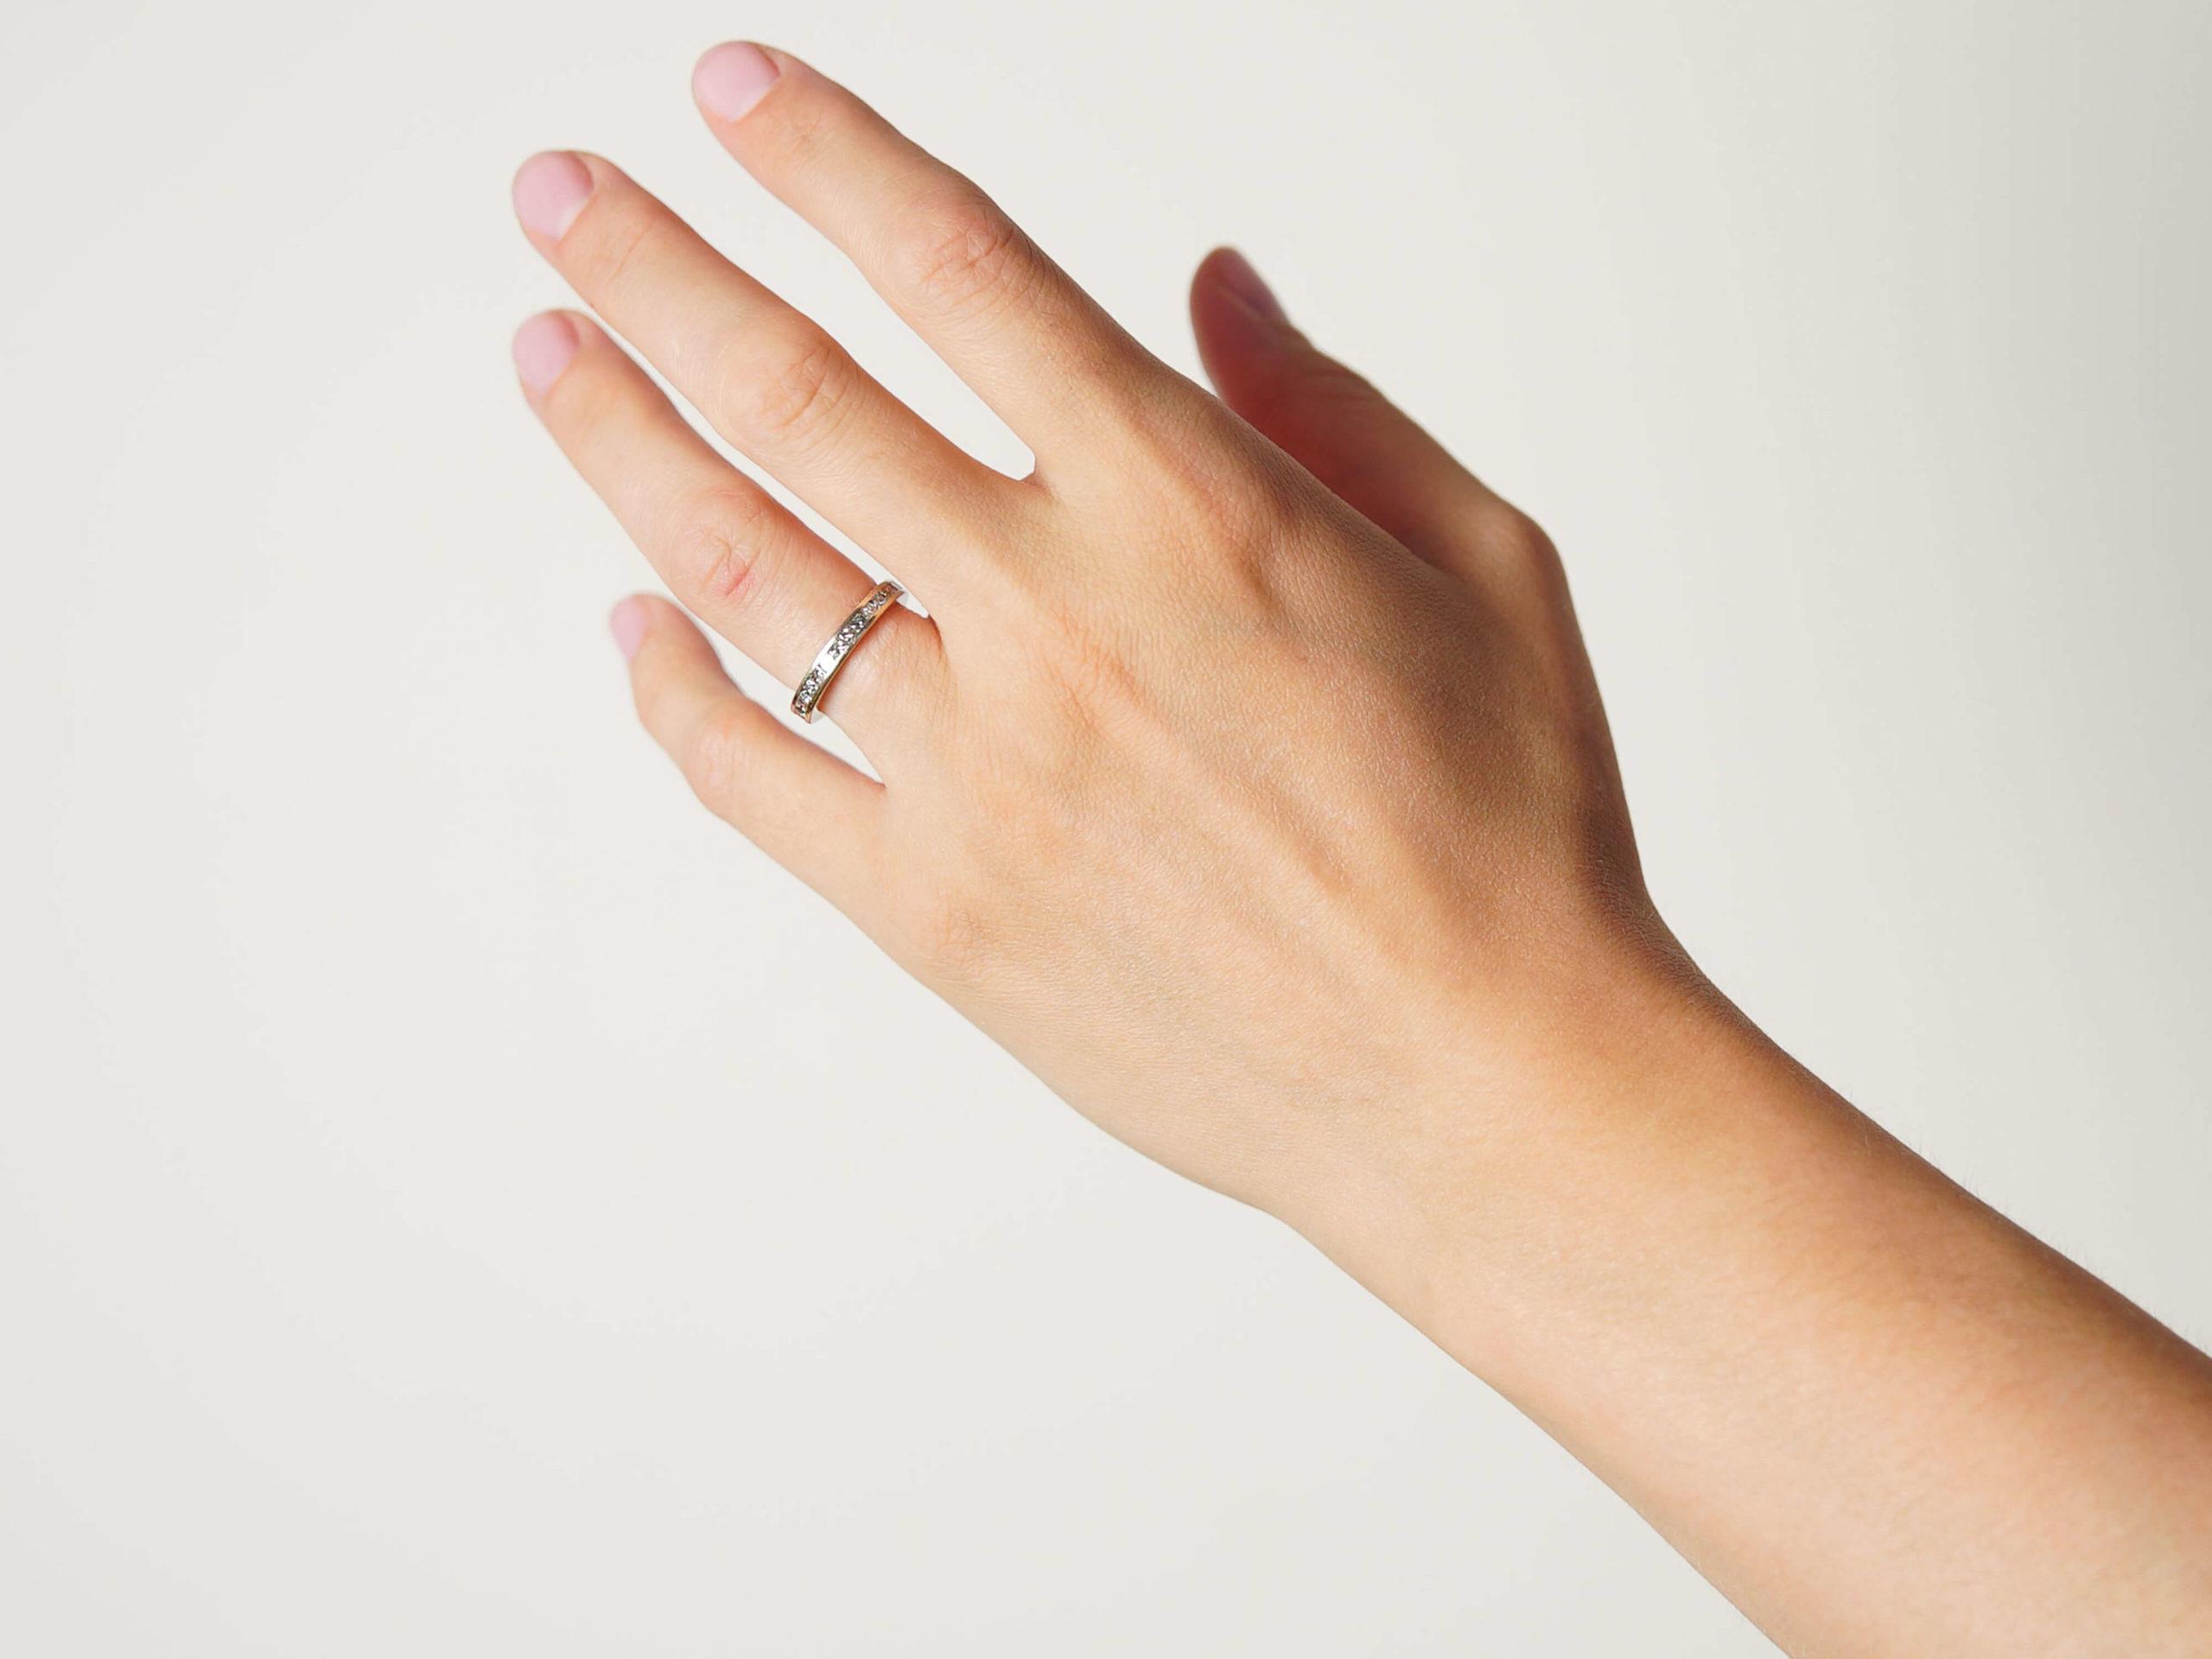 18ct White Gold & Square Cut Diamond Eternity Ring